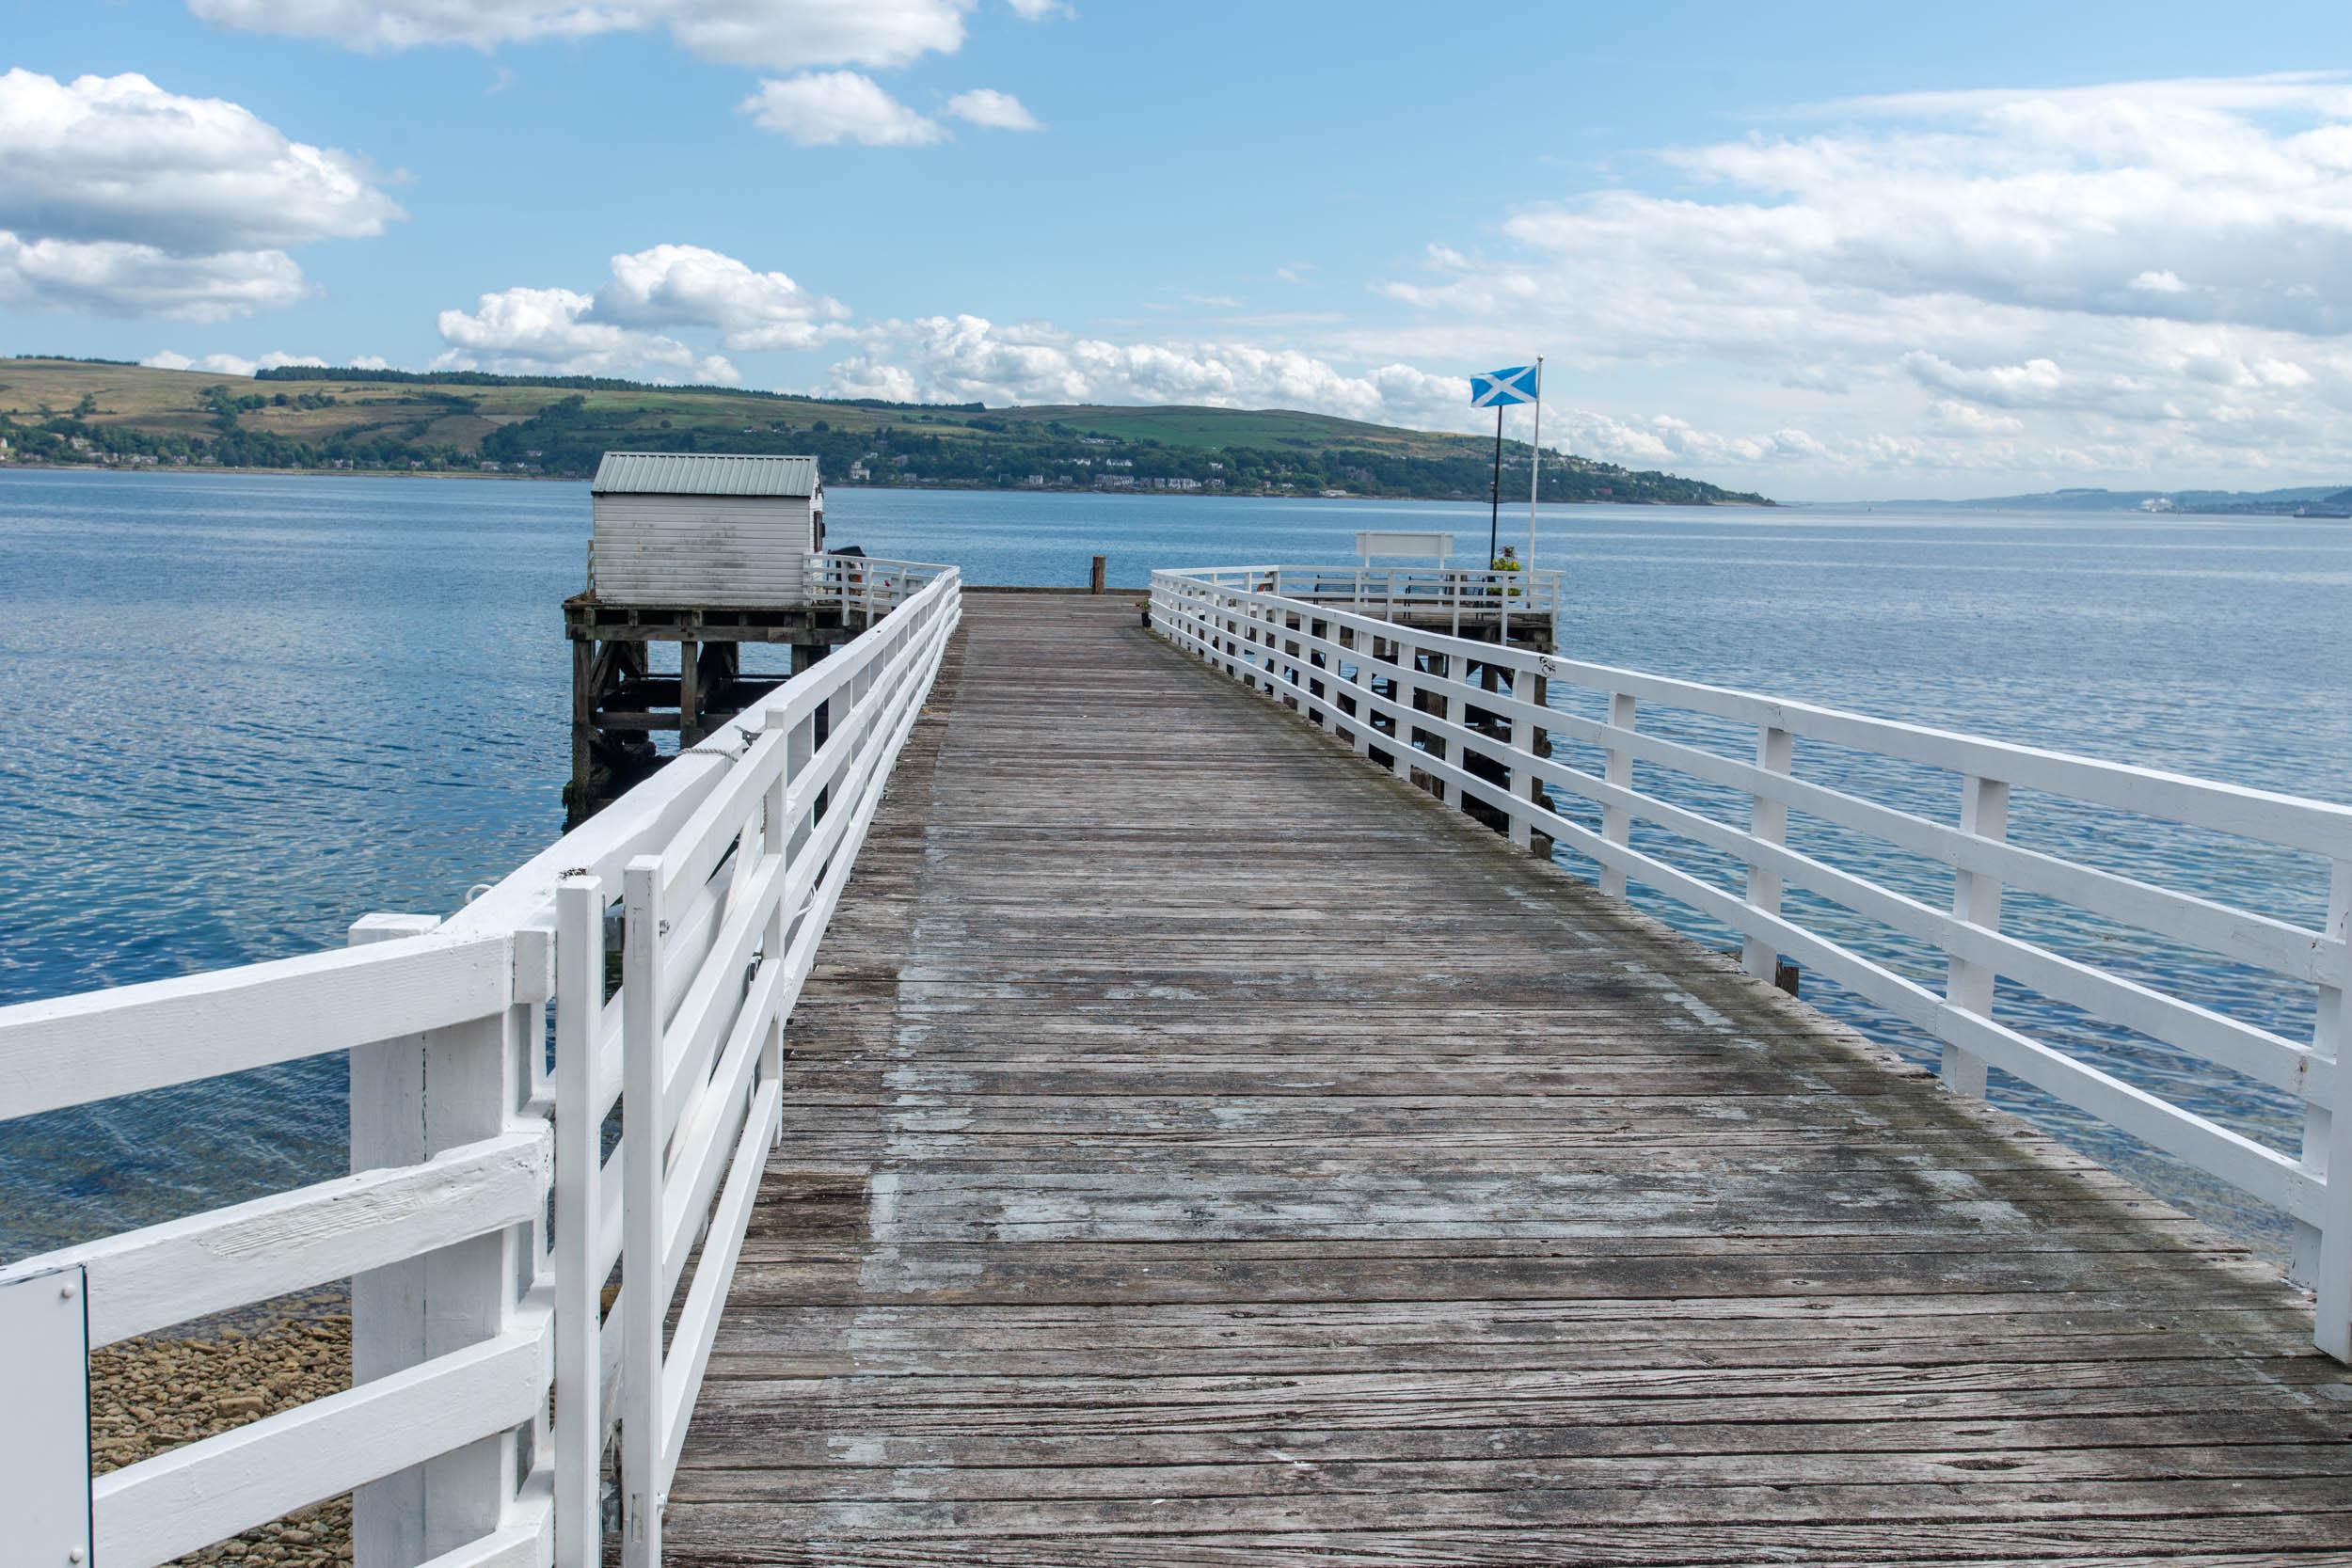 Blairmore Pier, Loch Long